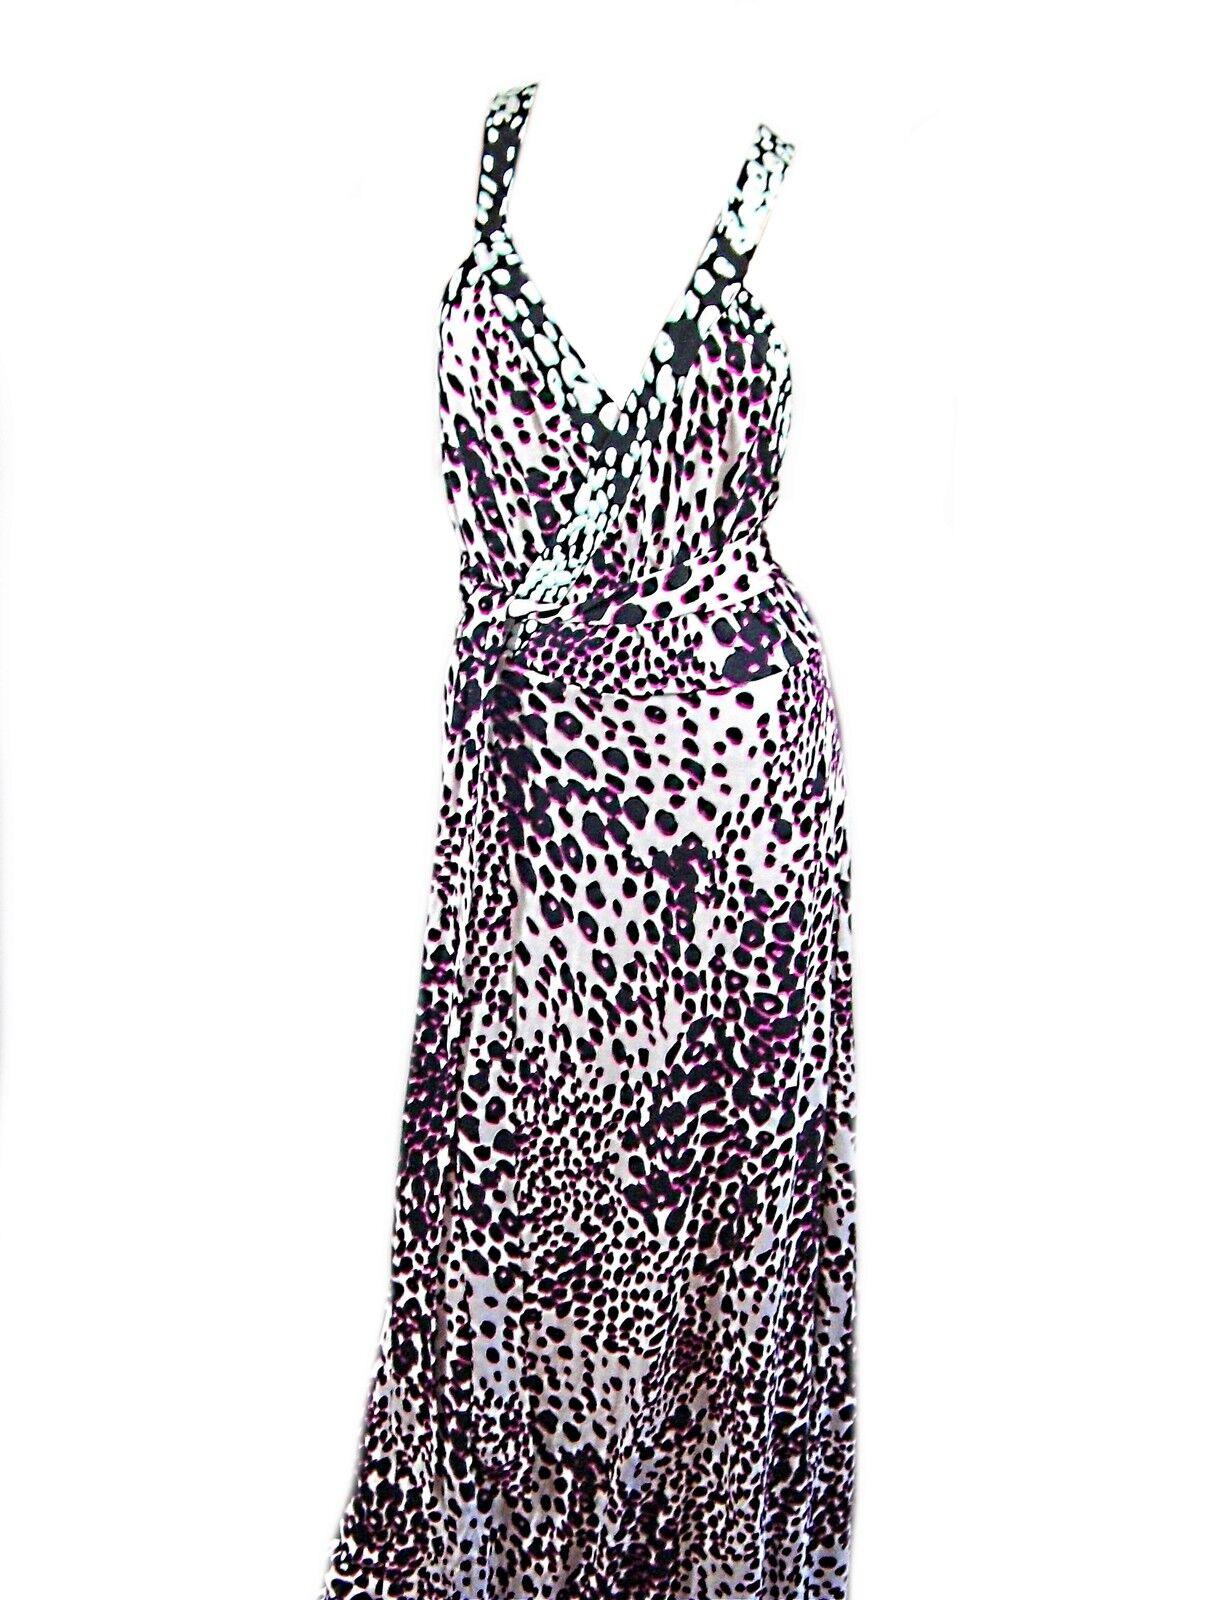 Diane von Furstenberg Furstenberg Furstenberg  Samson  Wrap Maxi Dress Leopard Rain Spots Combo Size 12 32e331